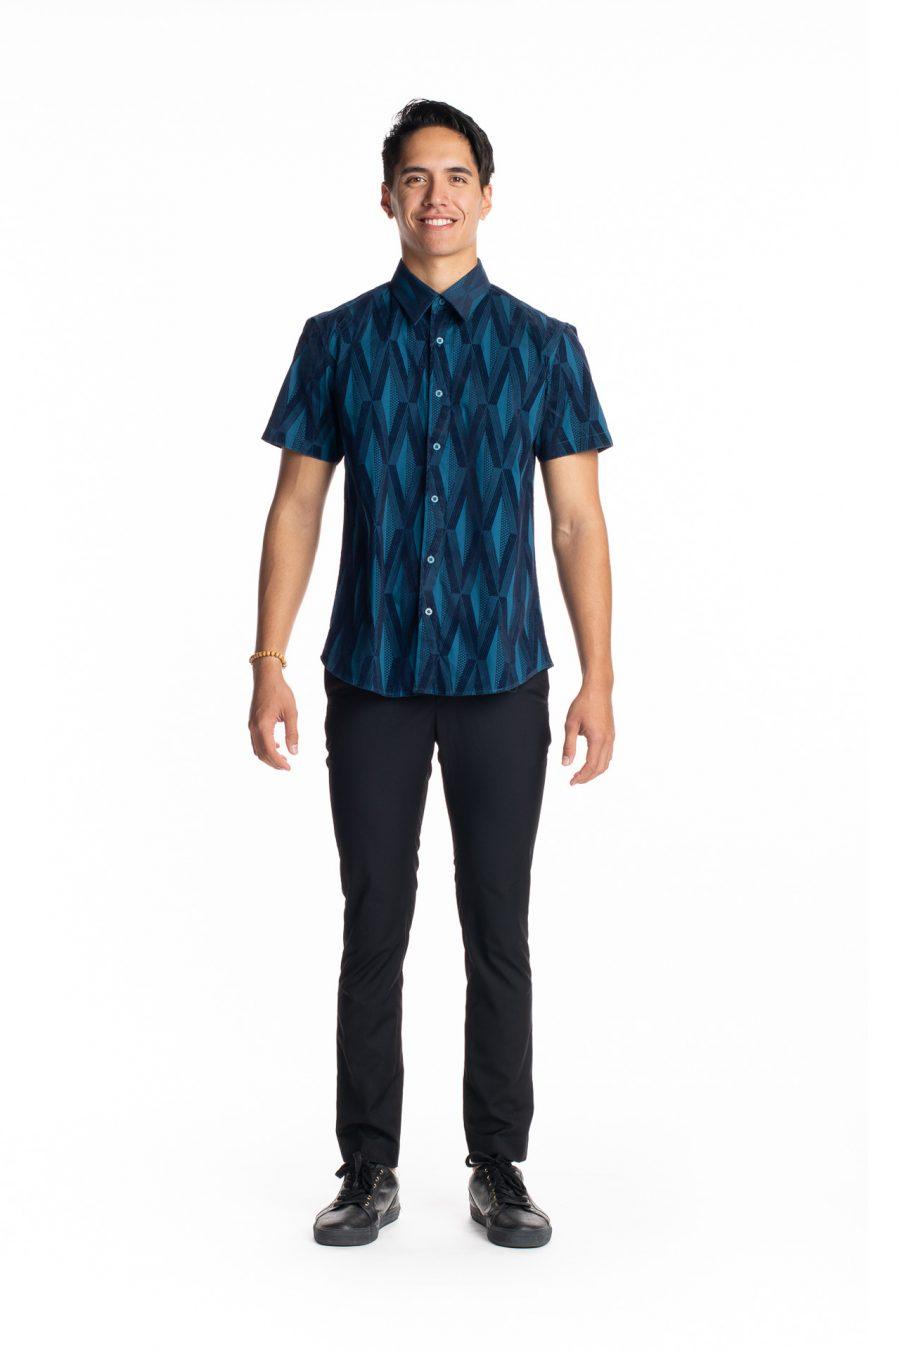 Male Model wearing Aloha Short Sleeve in Teal Kanaloa - Front View